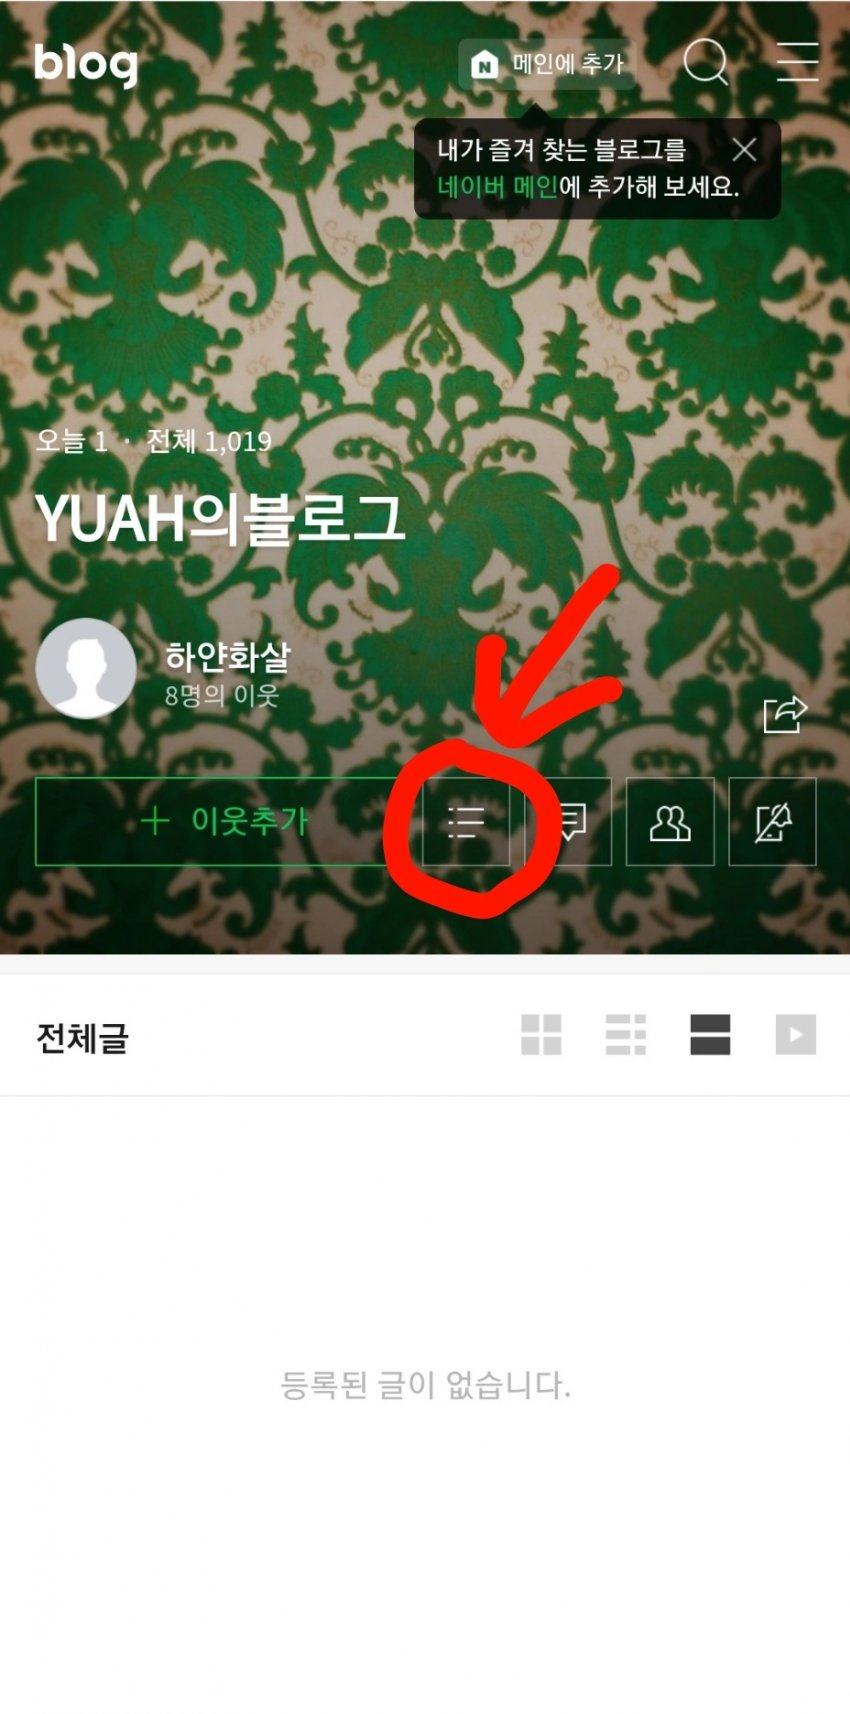 viewimage.php?id=2fbcc323e7d334aa51b1d3a24781&no=24b0d769e1d32ca73fec8efa11d02831835273132ddd61d36cf617d09c4dd54d248045c8570d0fa9e6b14d50c9703f720dc4bddb8e8ae11acb8f9b05a0ae46ad70ef12fd772aff30c6b36d4b2534f424f401523e10c481851e428a31